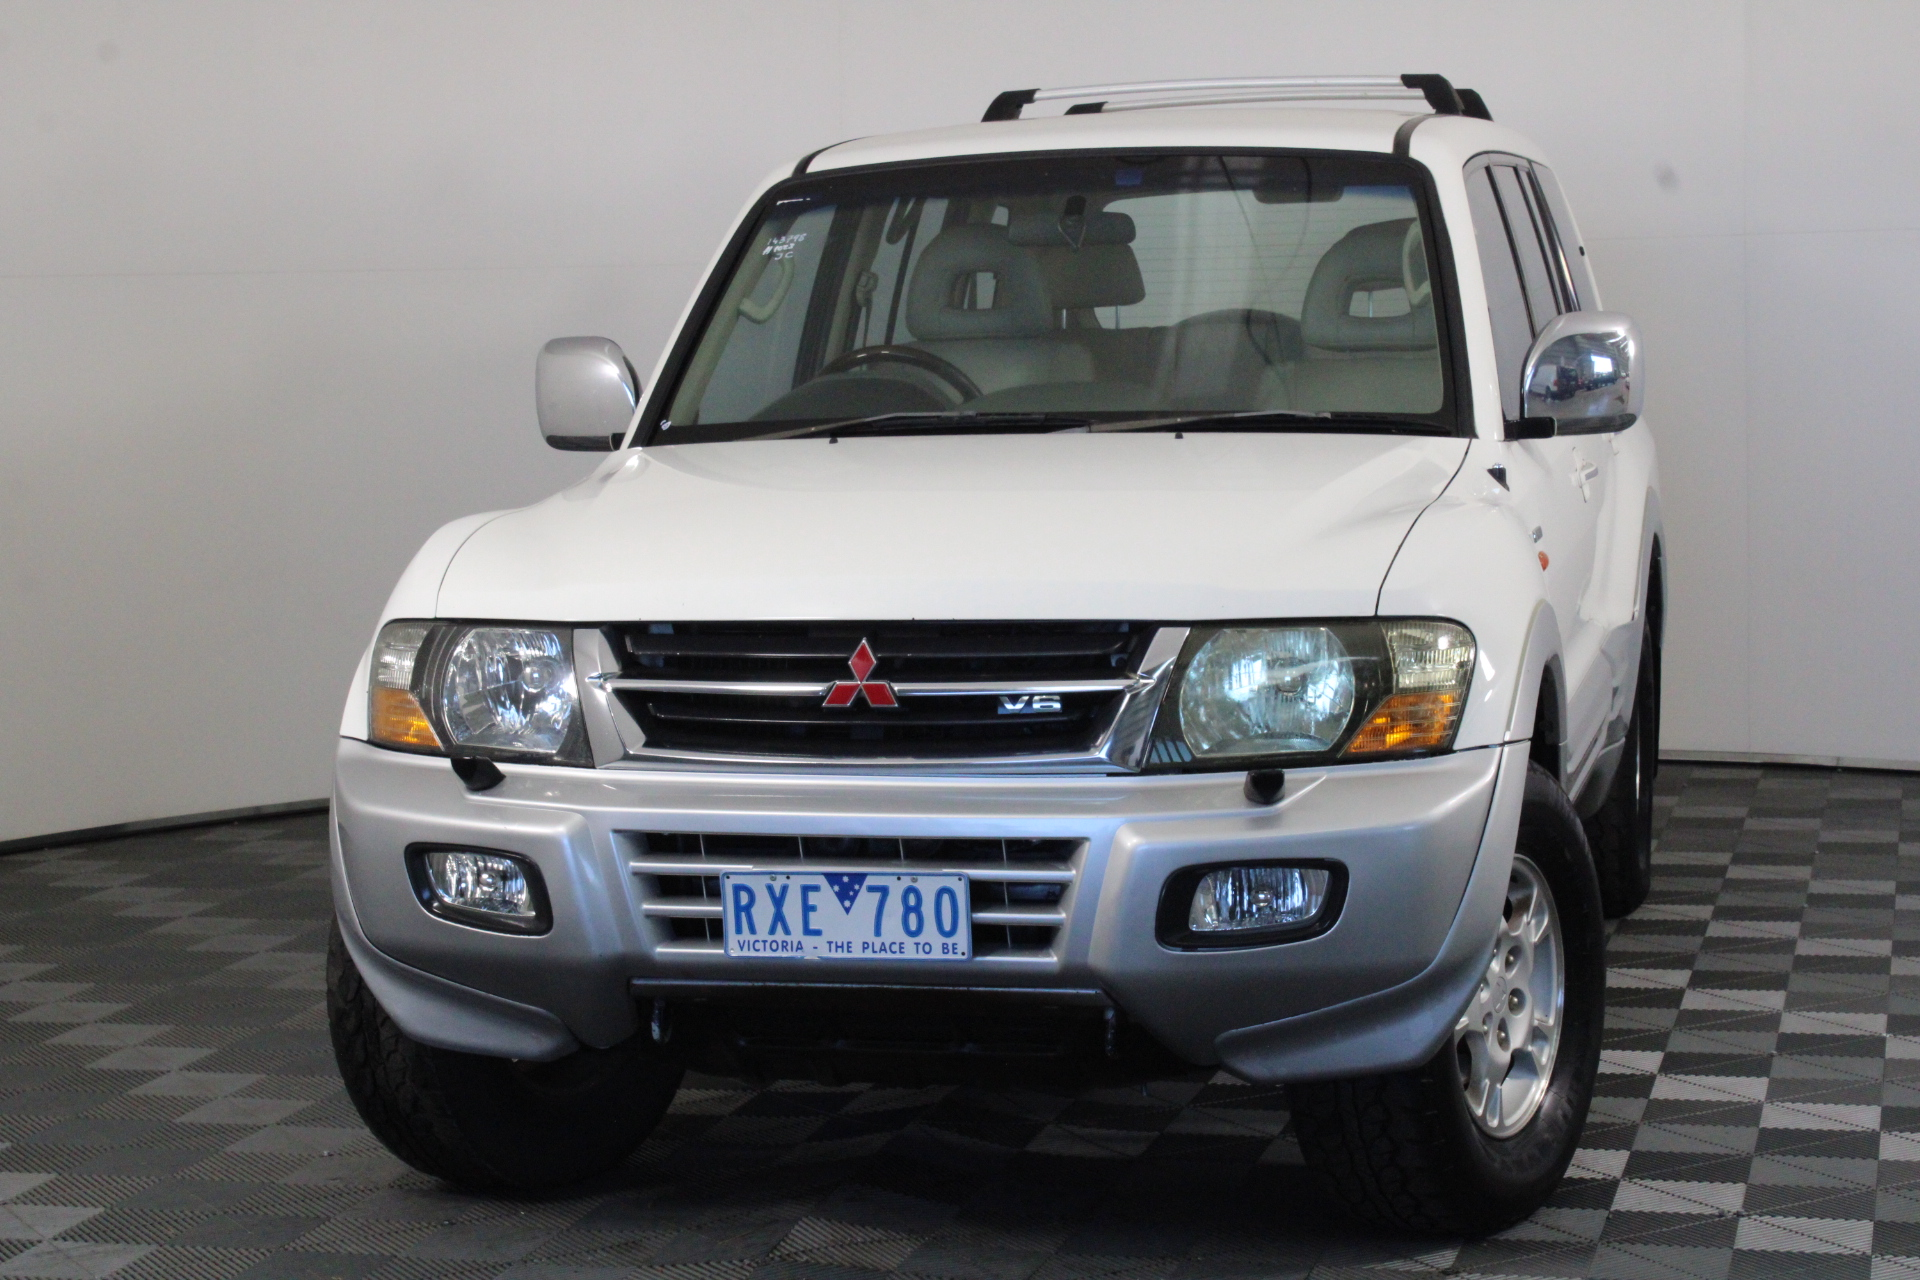 2002 Mitsubishi Pajero GLS LWB (4x4) Exceed NM Automatic 7 Seats Wagon